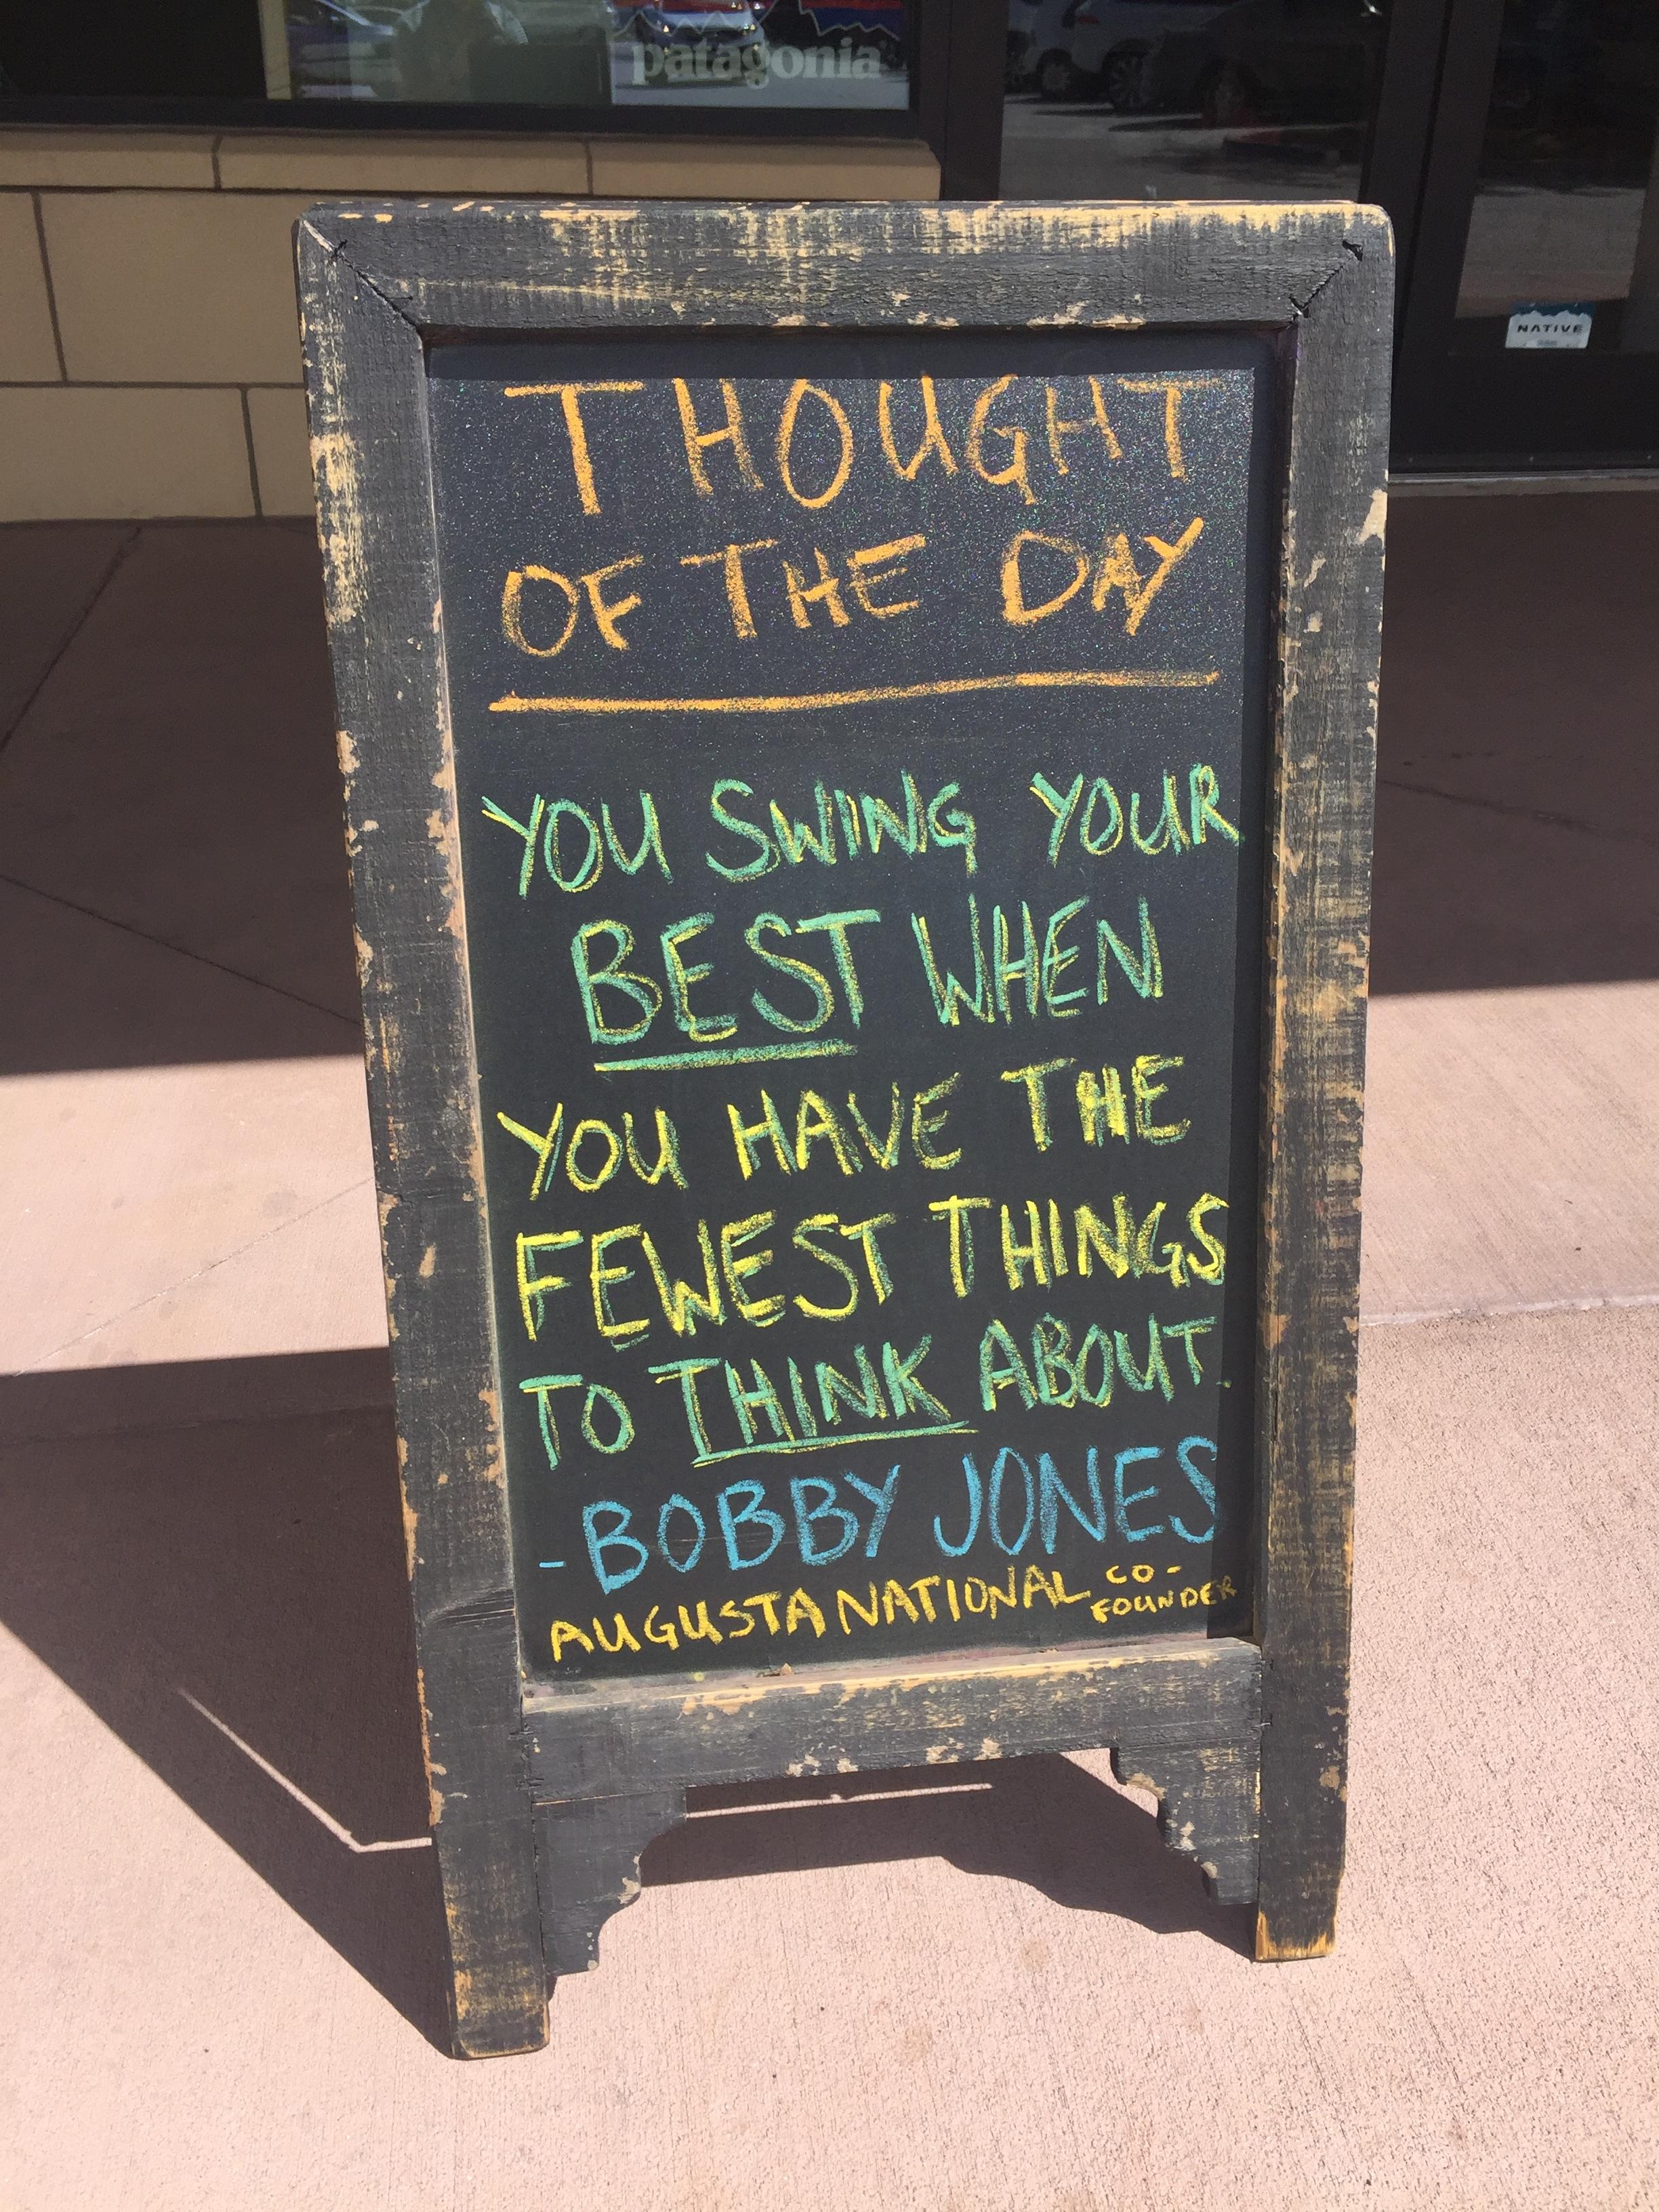 Bobby Jones golf swing quote